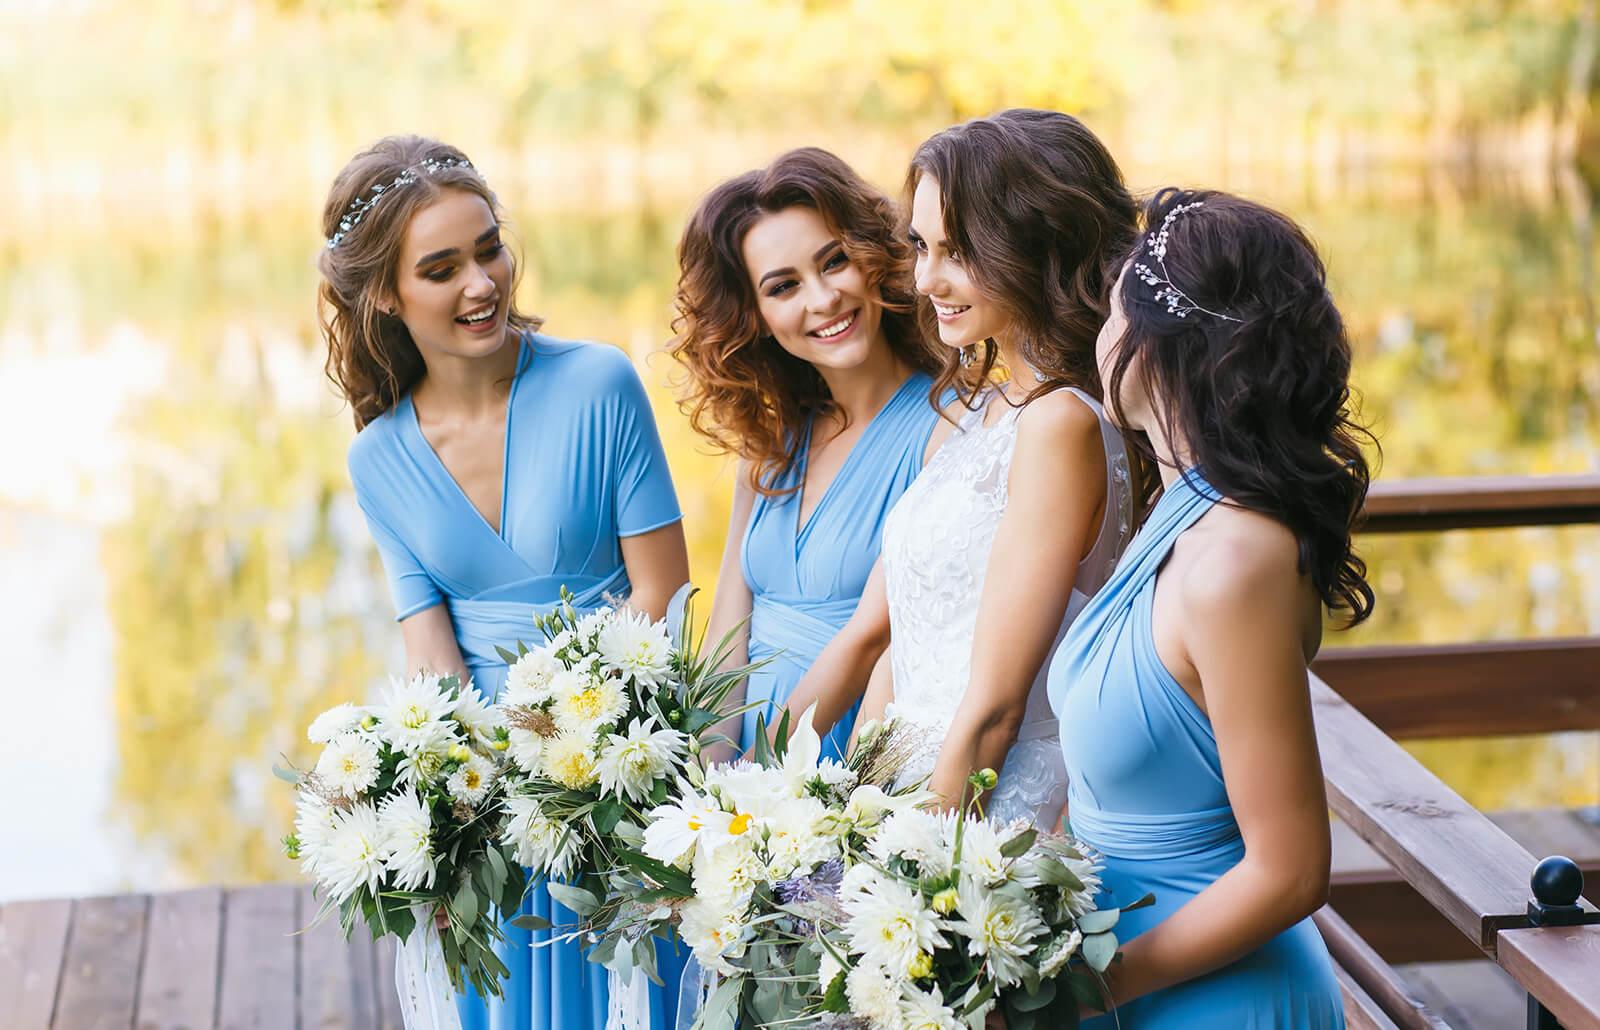 vestir-boda-otono.jpg